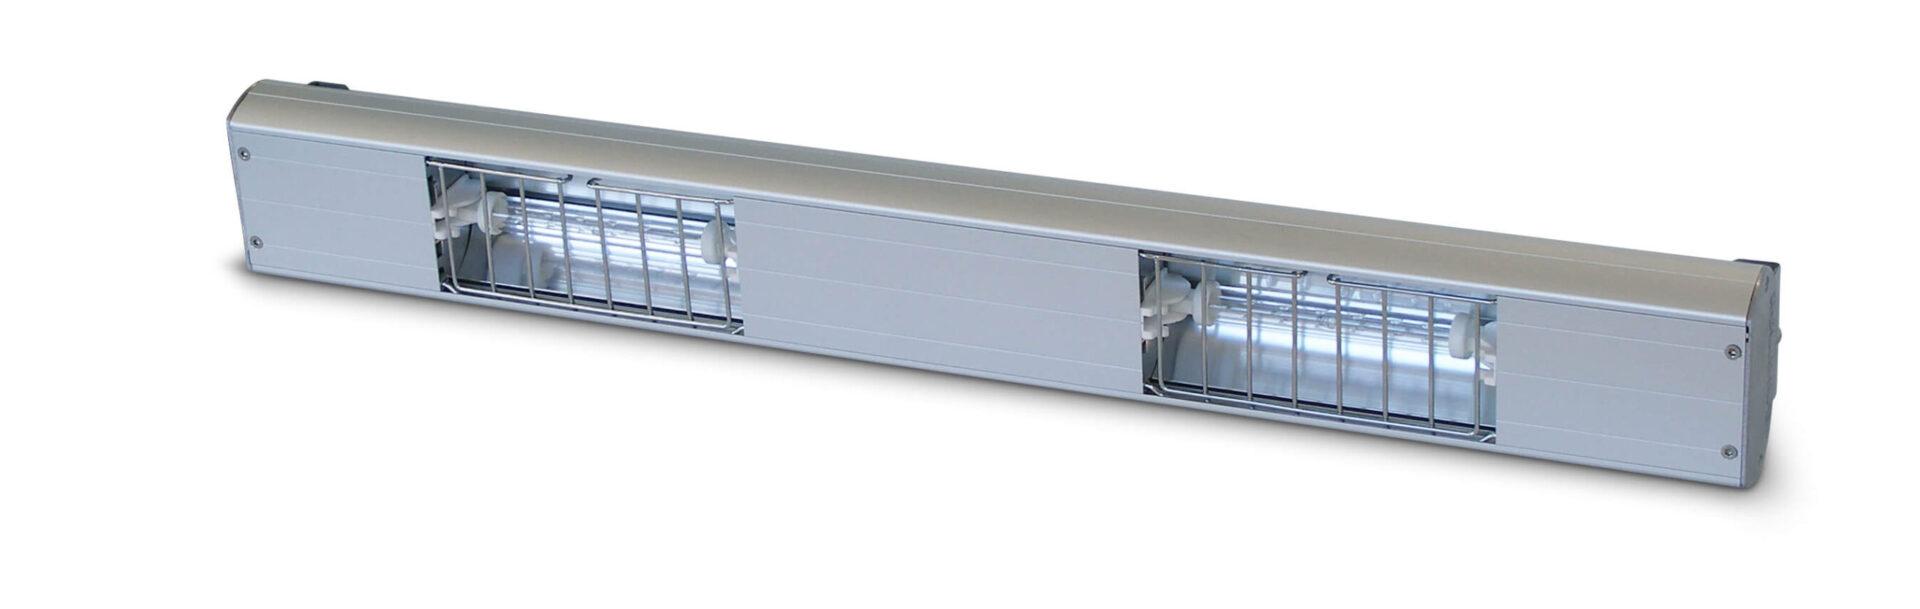 Roband Fabricator Quartz Heat Lamp Assembly 825mm